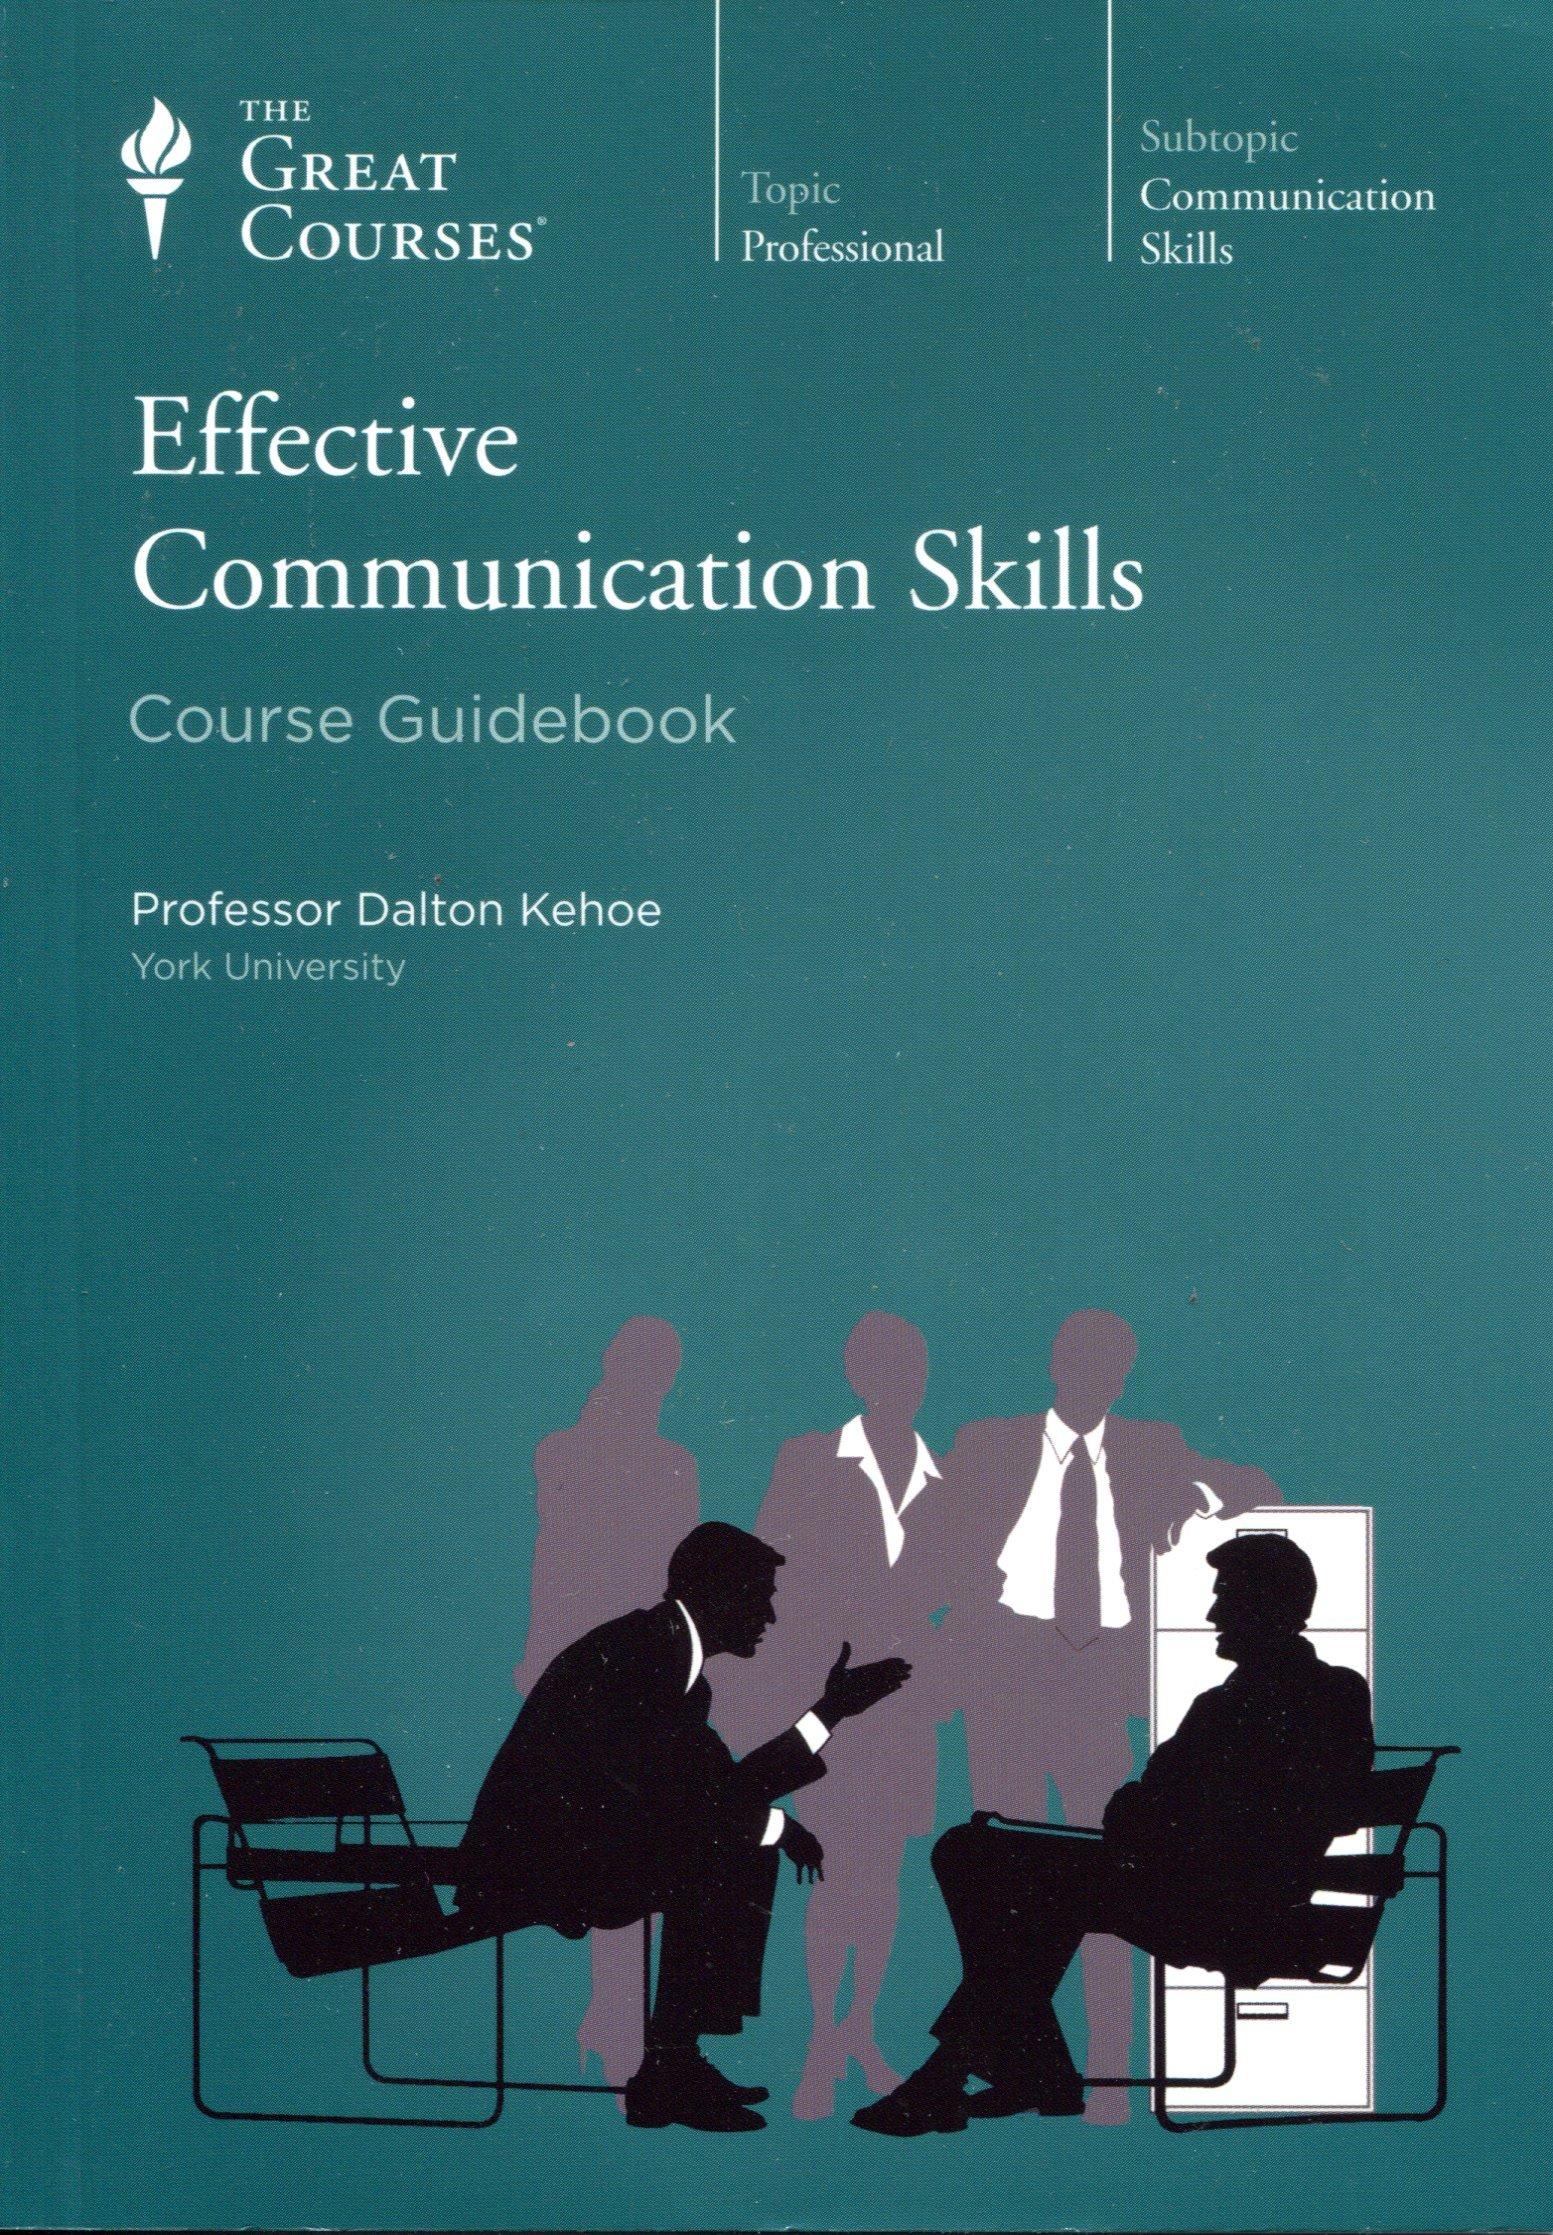 Effective Communication Skills (Course Guidebook) (Great Course #9331), Professor Dalton Kehoe